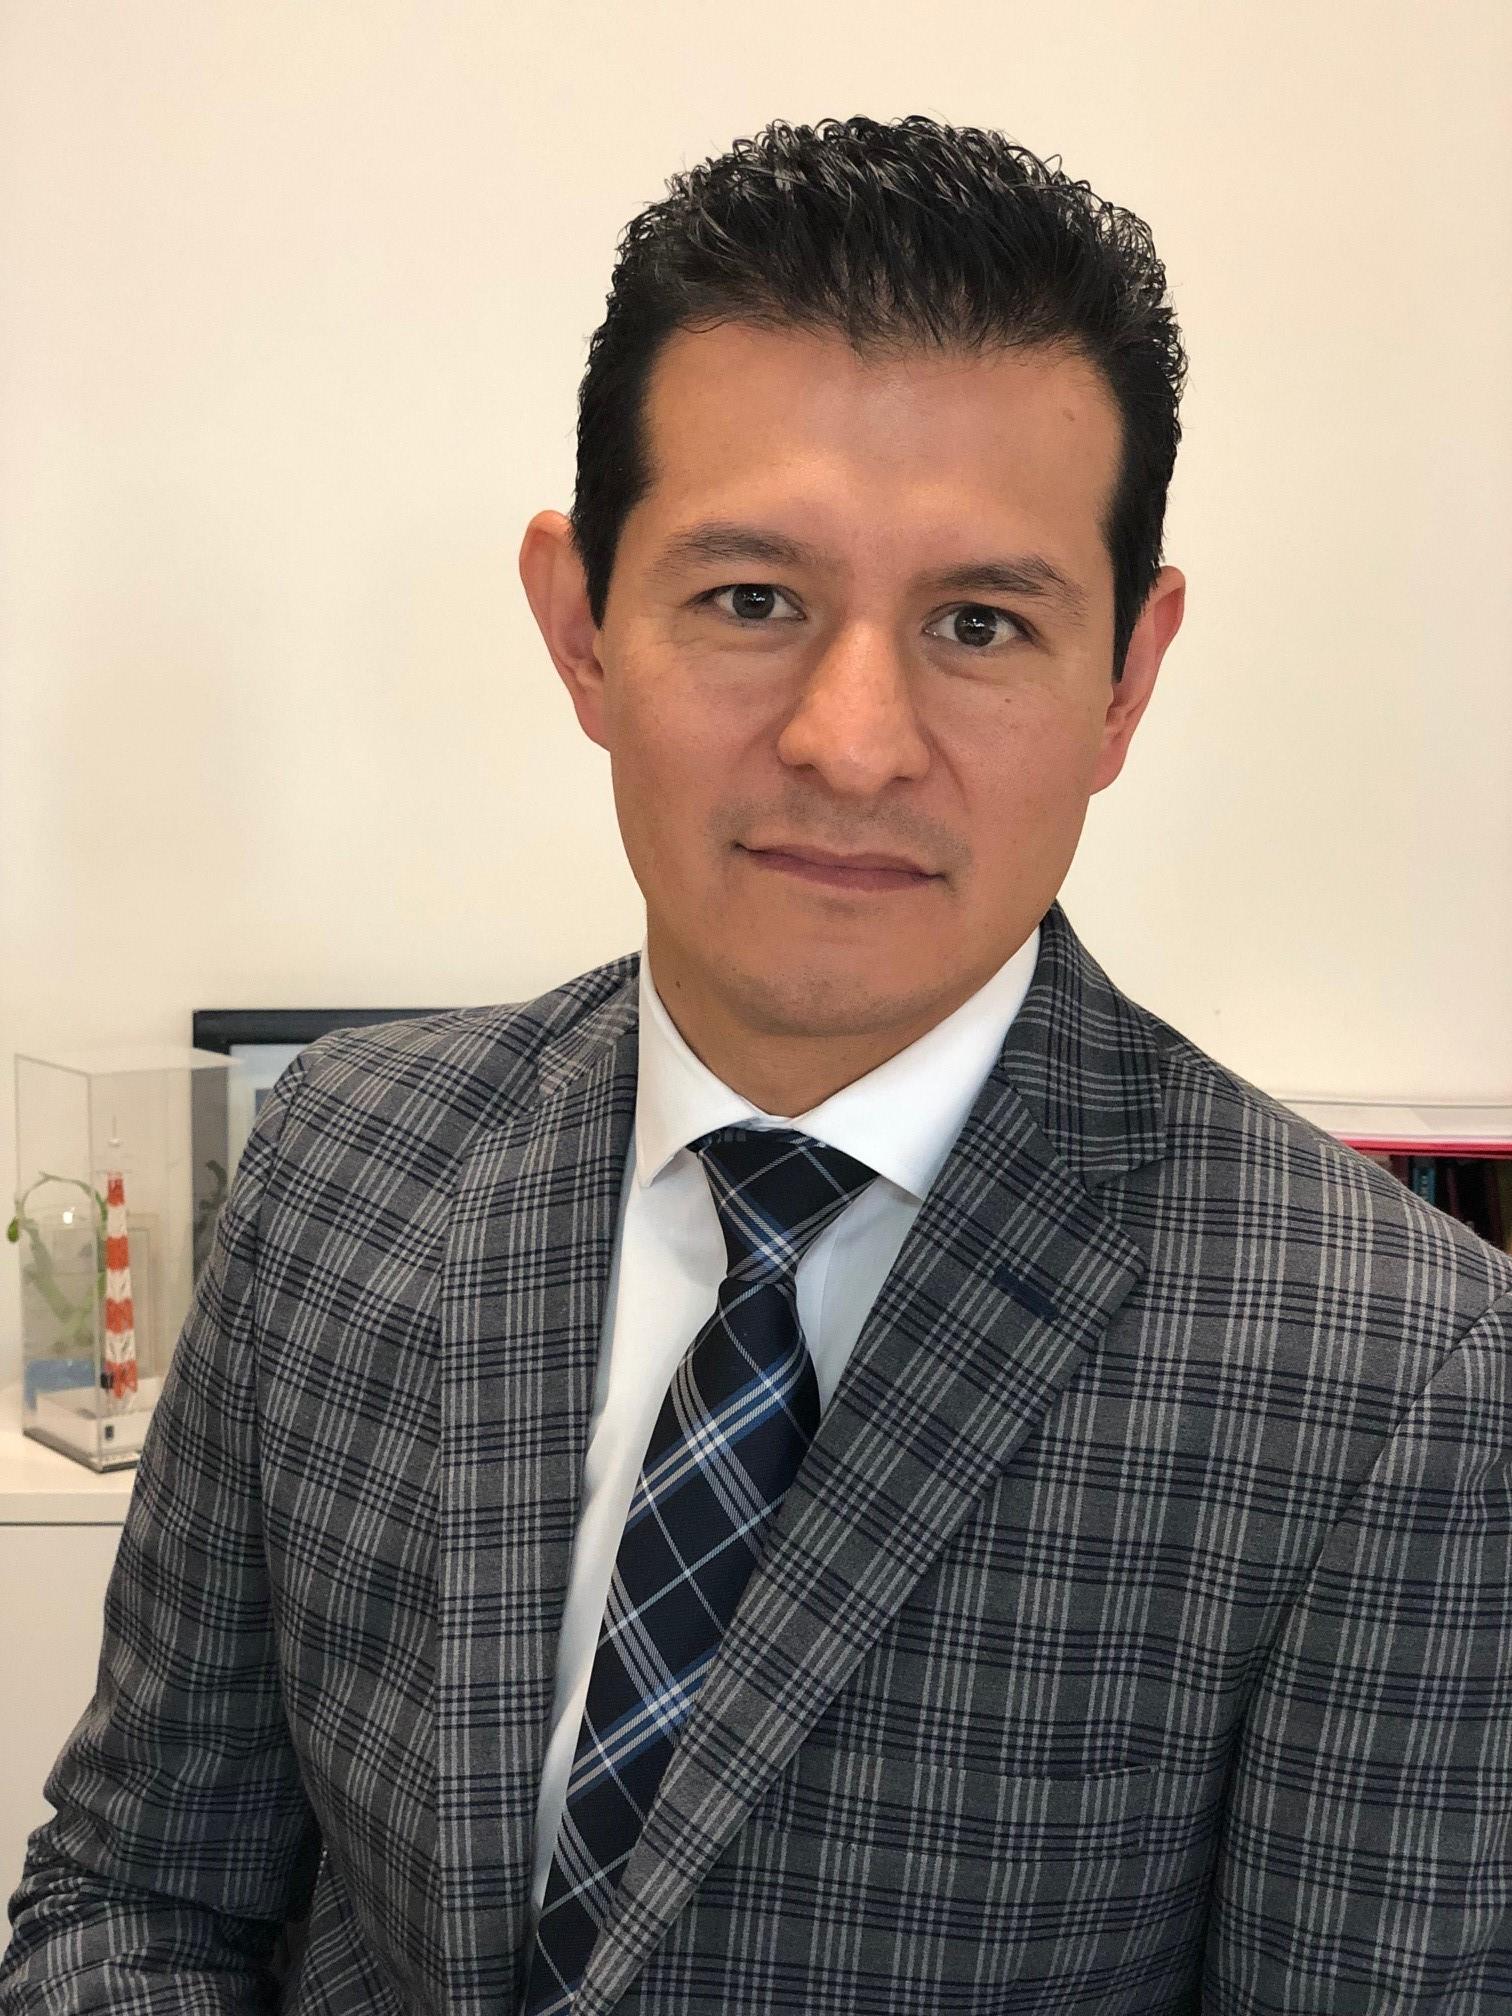 Eriván Urióstegui Hernández::Eriván Urióstegui Hernández